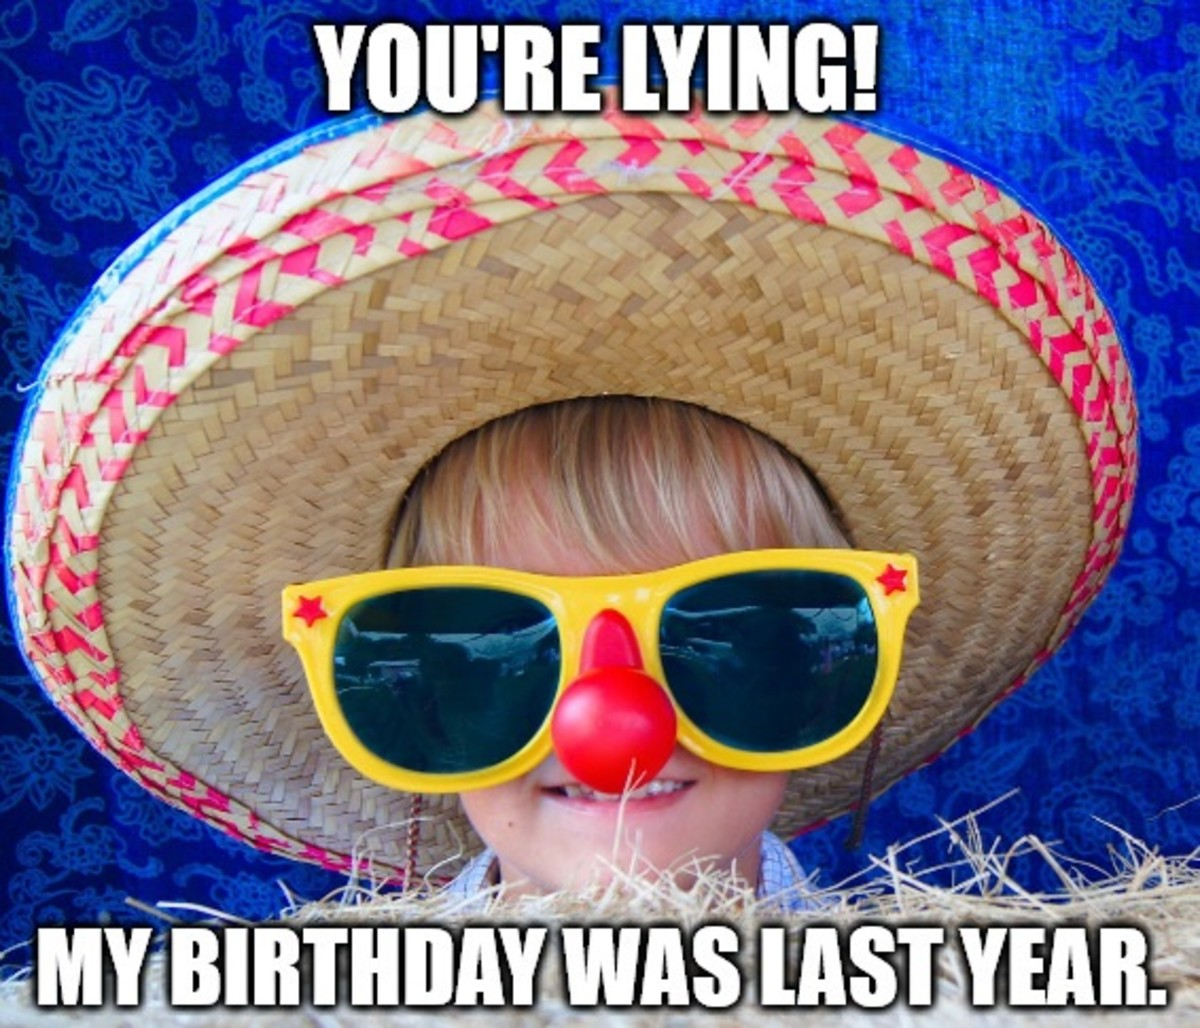 Your lying! My birthday was last year.